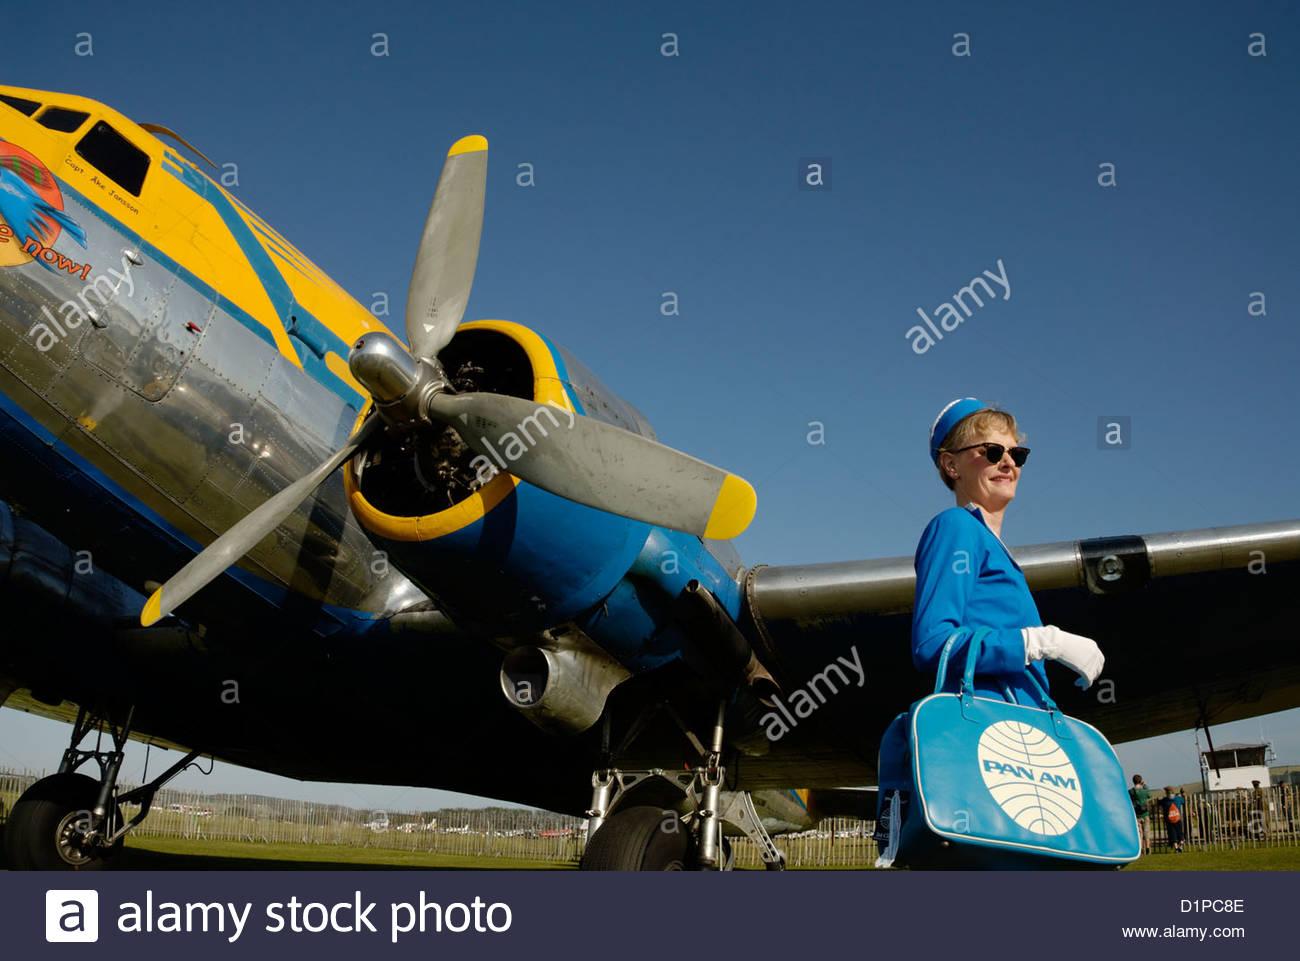 air stewardess stockfotos air stewardess bilder alamy. Black Bedroom Furniture Sets. Home Design Ideas